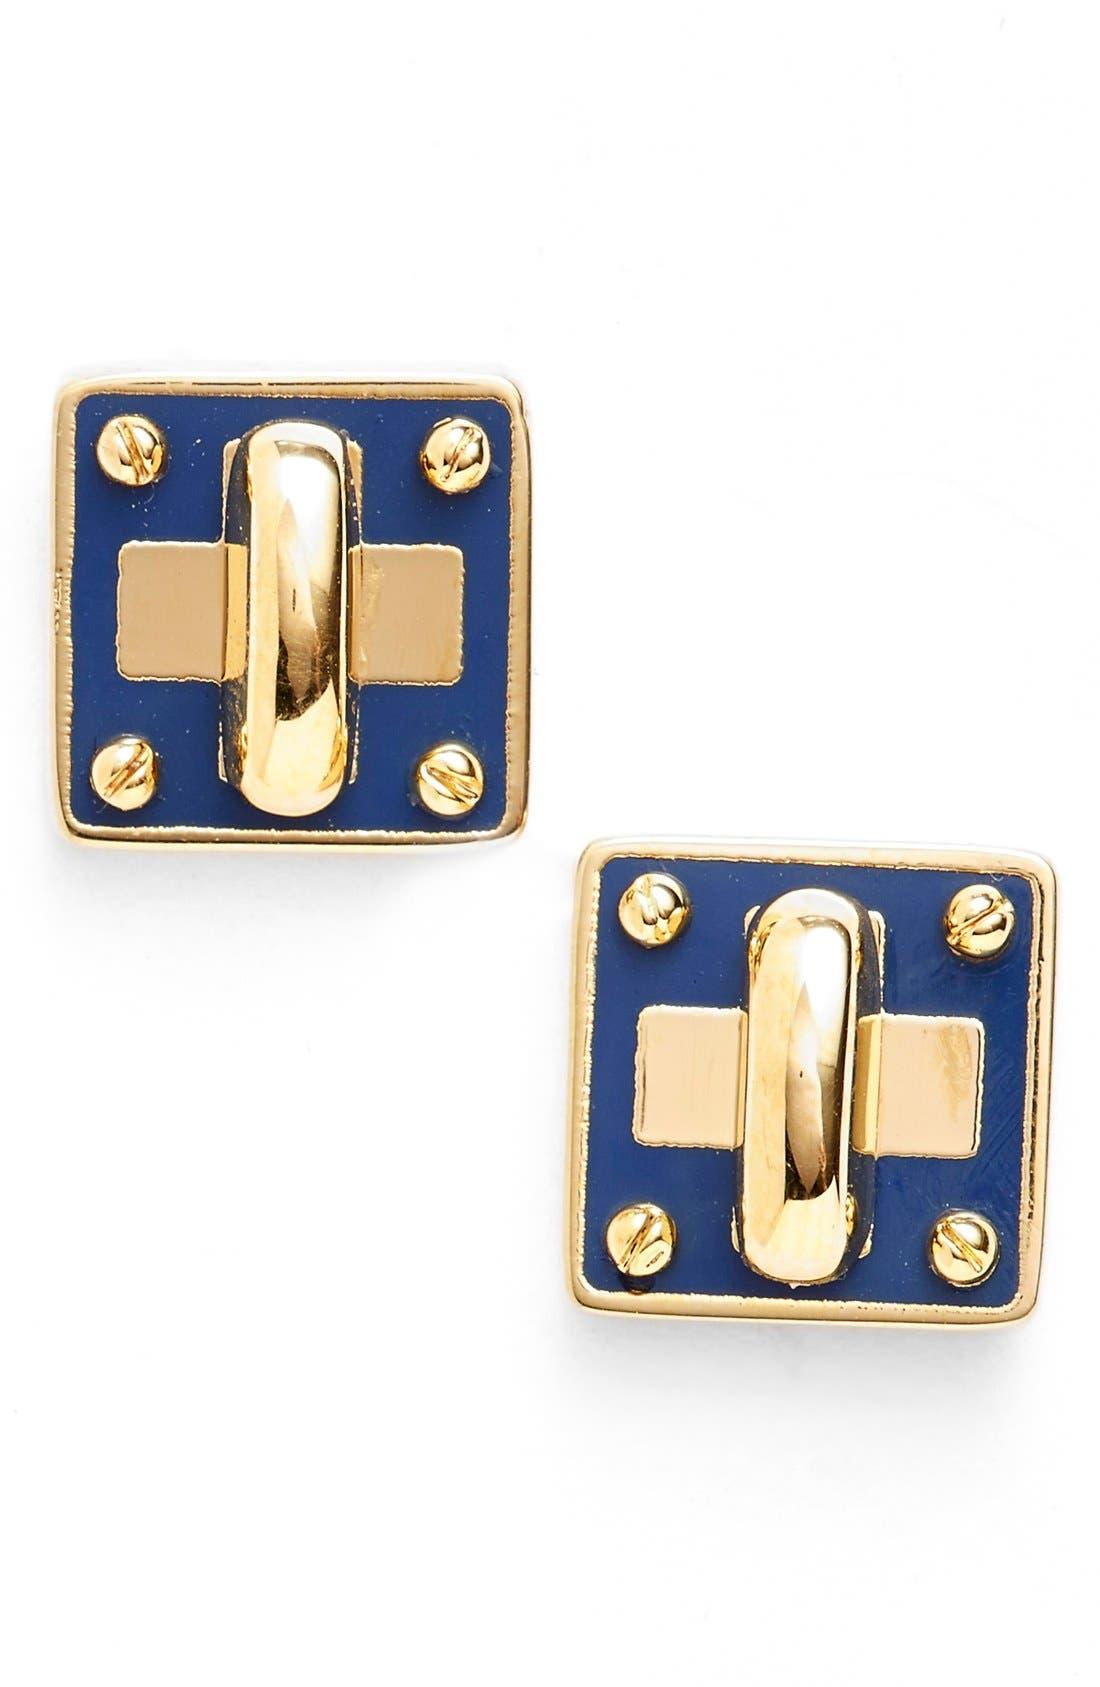 MARC BY MARC JACOBS 'Turnlock' EnamelStud Earrings